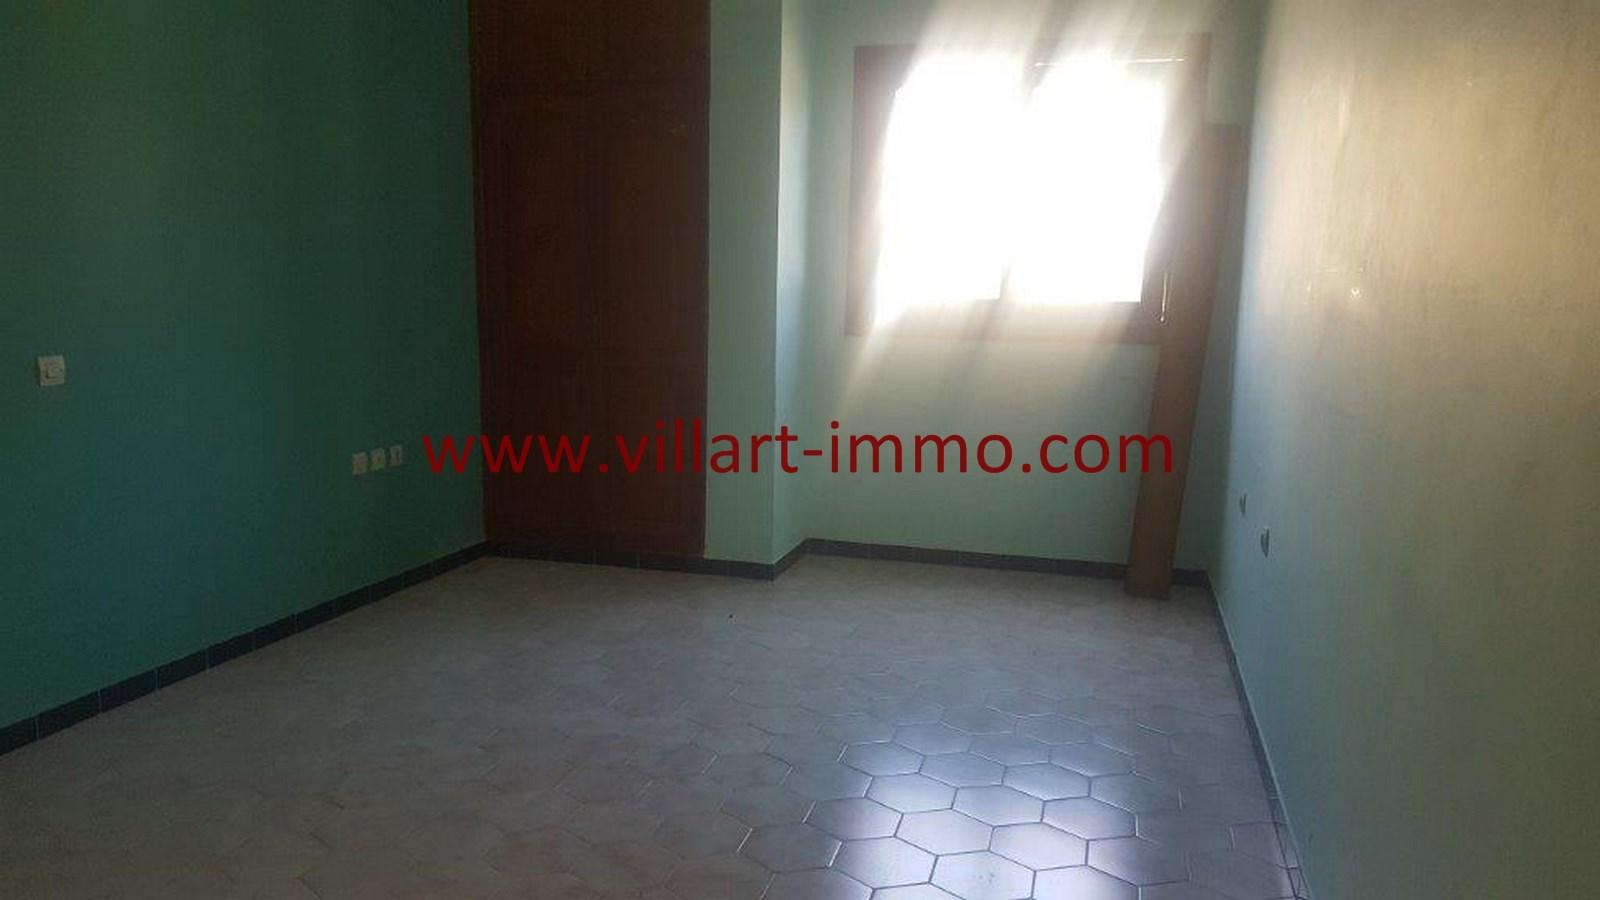 13-Vente-Villa-Tanger-Moujahidin-Chambre 4-VV491-Villart Immo